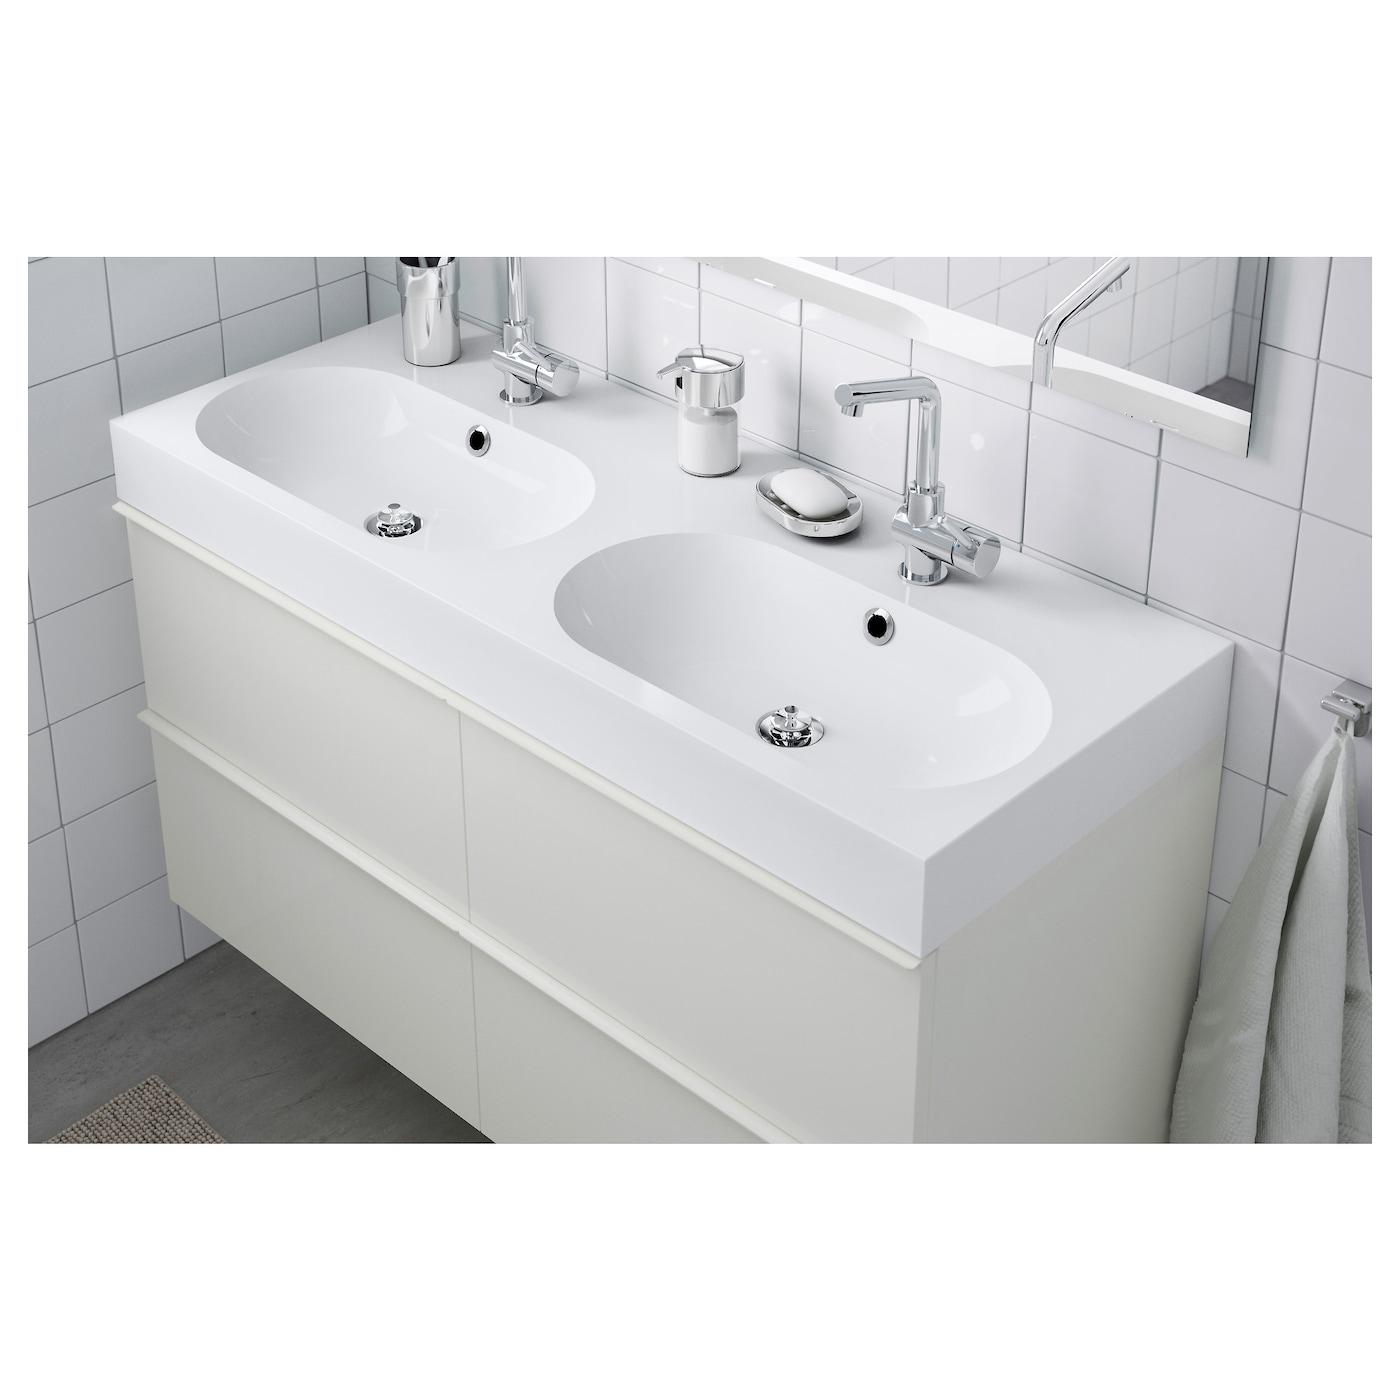 br viken lavabo dble blanc 120x49x10 cm ikea. Black Bedroom Furniture Sets. Home Design Ideas